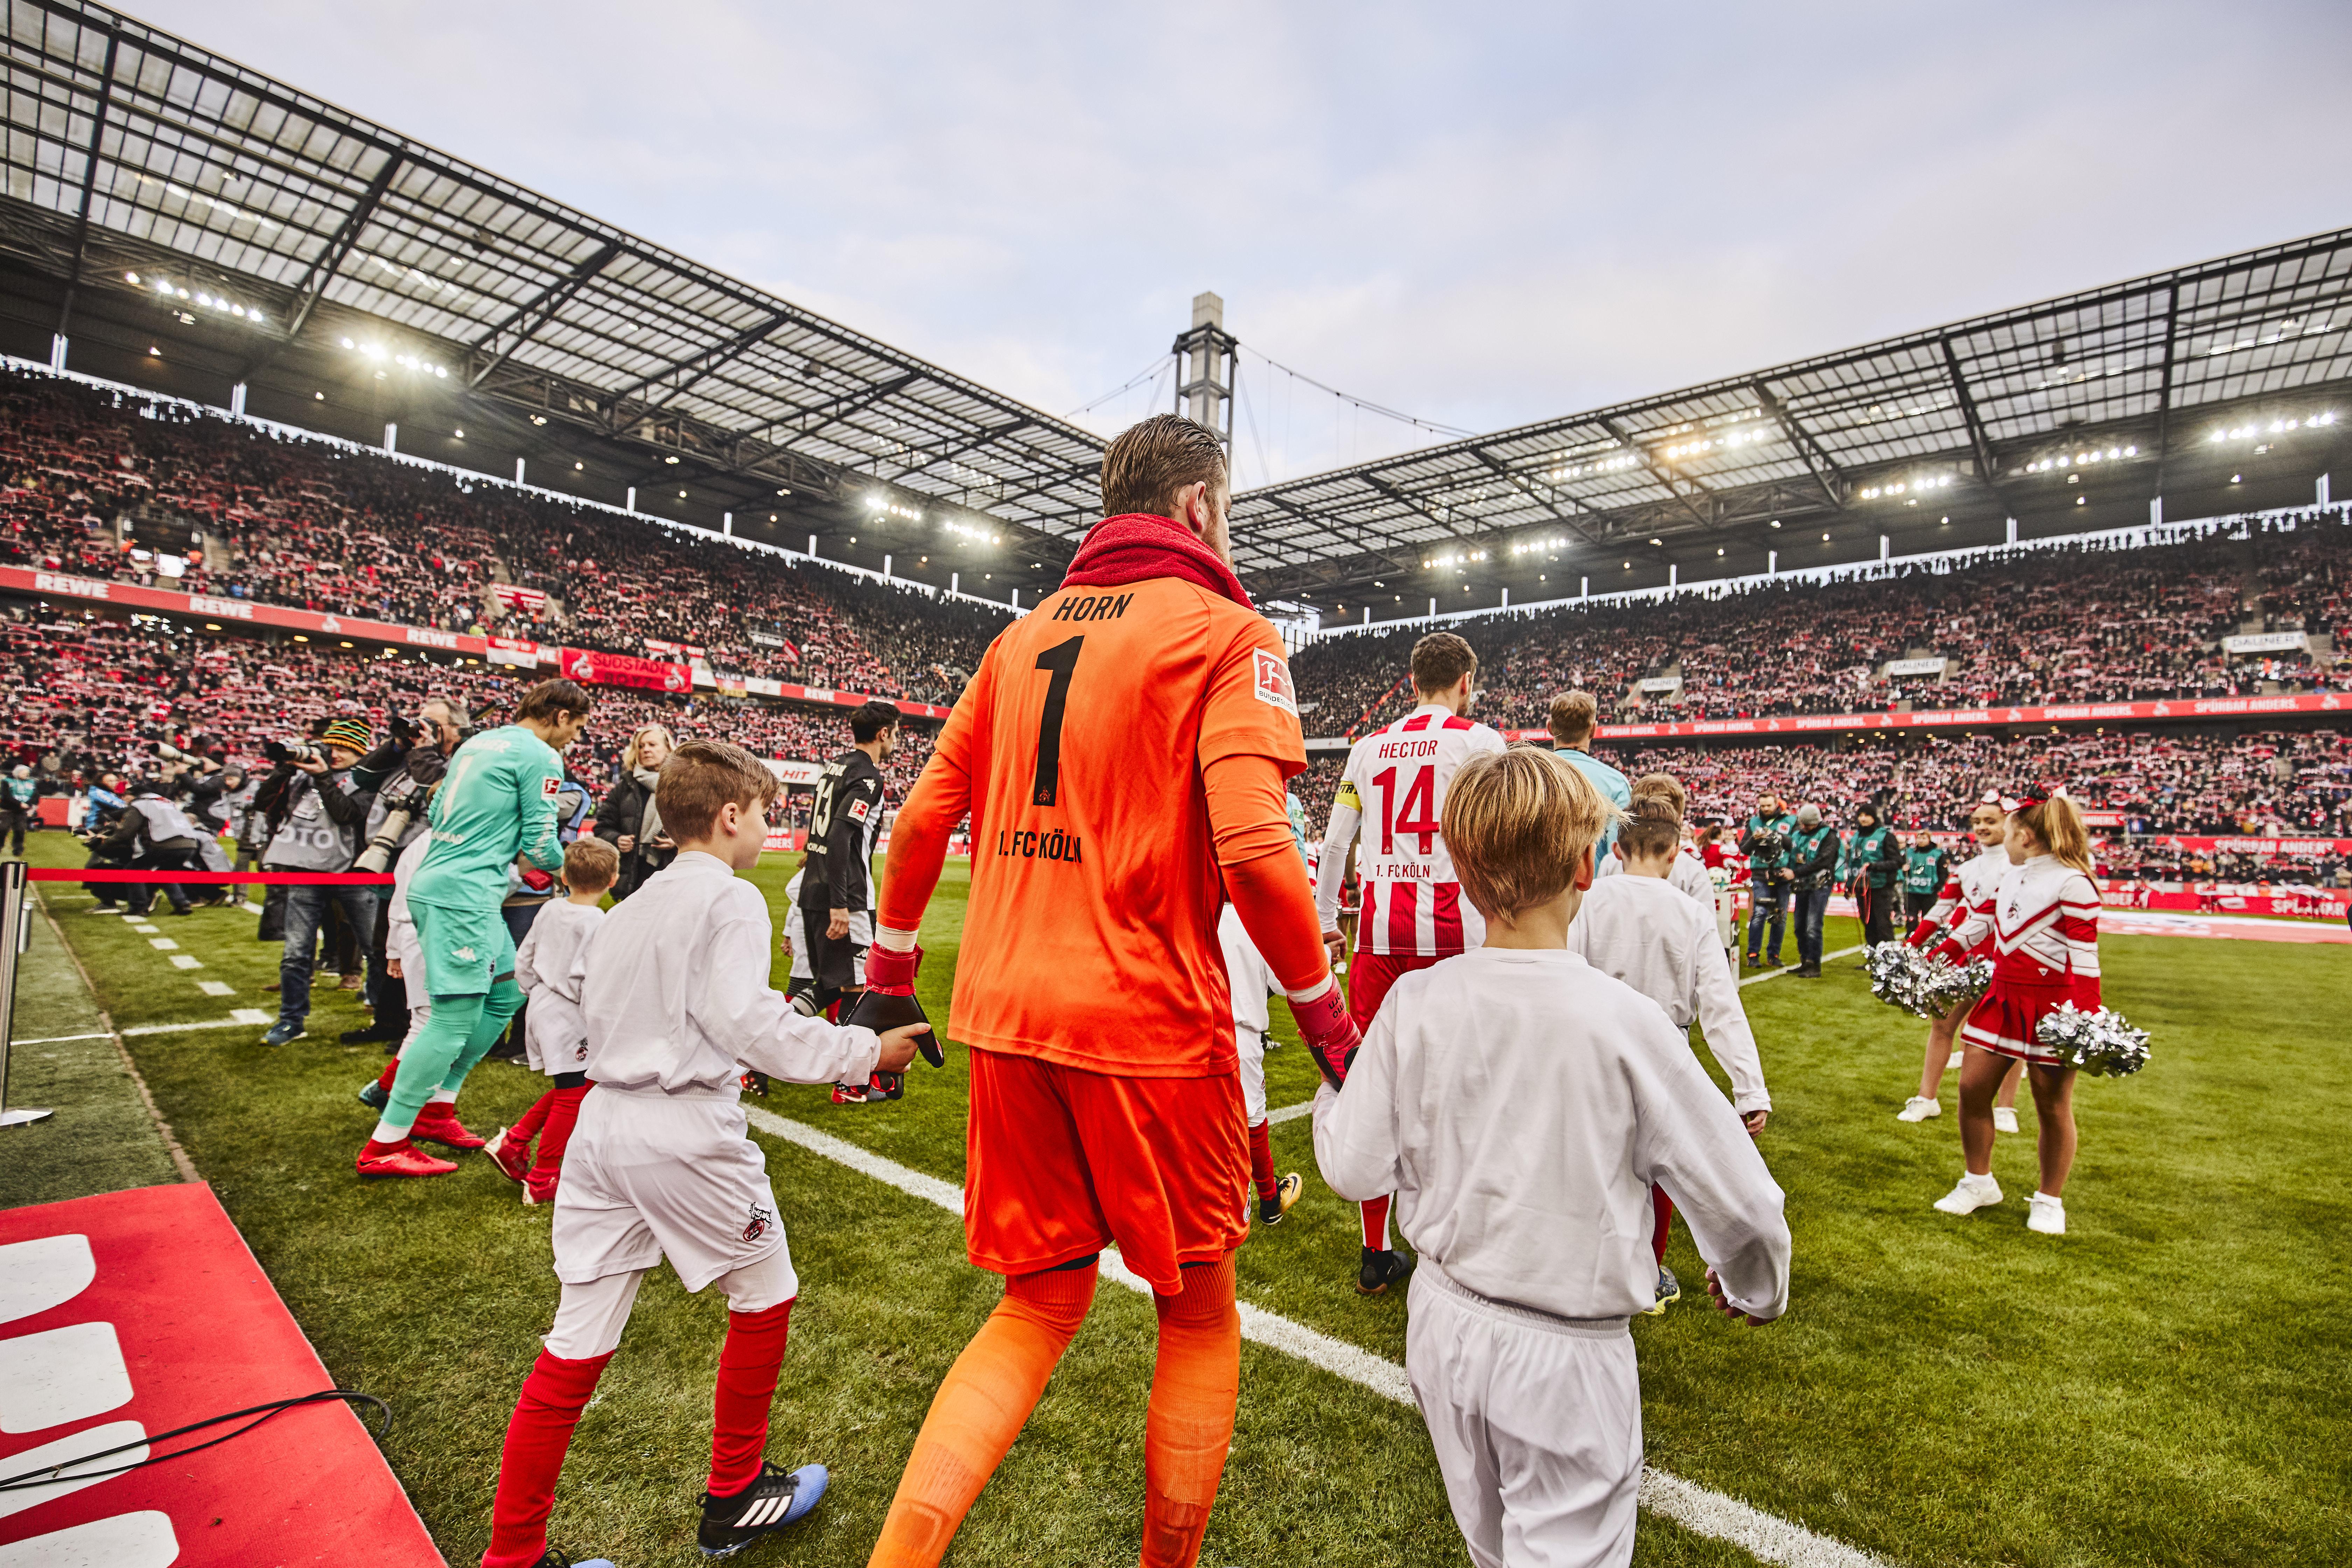 Partner Des Tages Devk Verschenkt Trikots An Fans Des 1 Fc Köln